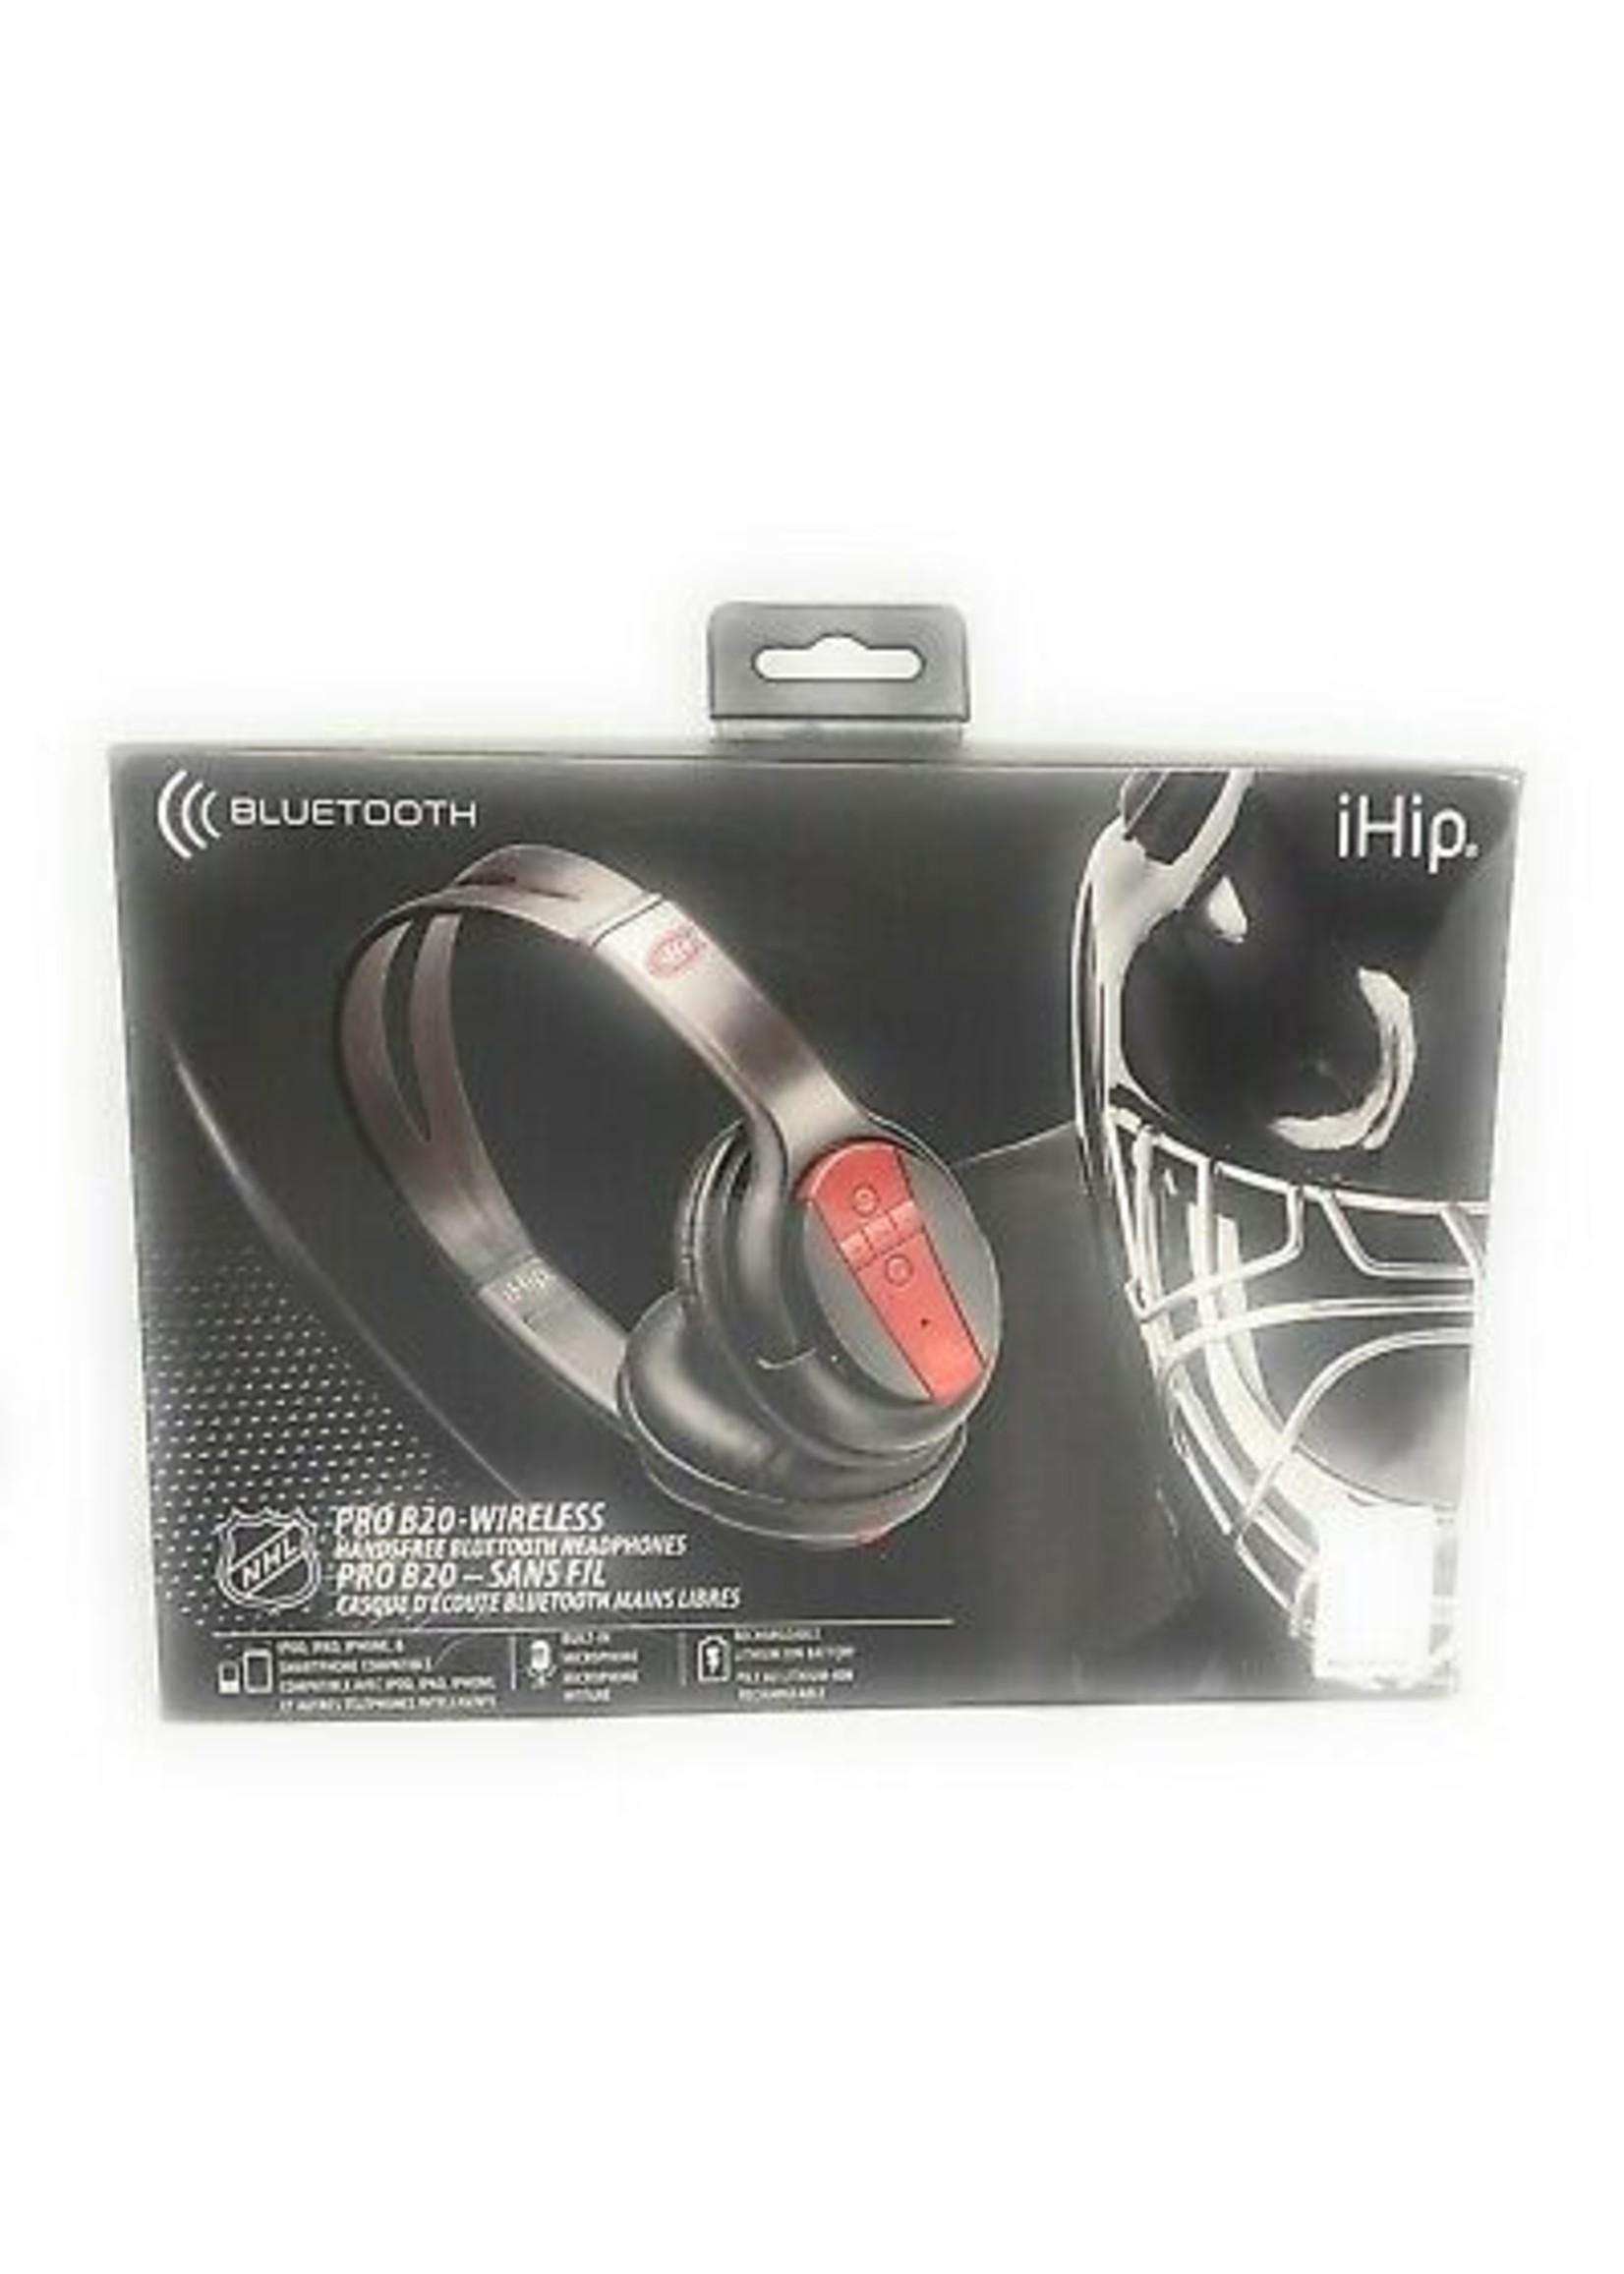 IHip Bluetooth Pro B20 Wireless Headphones Canadiens